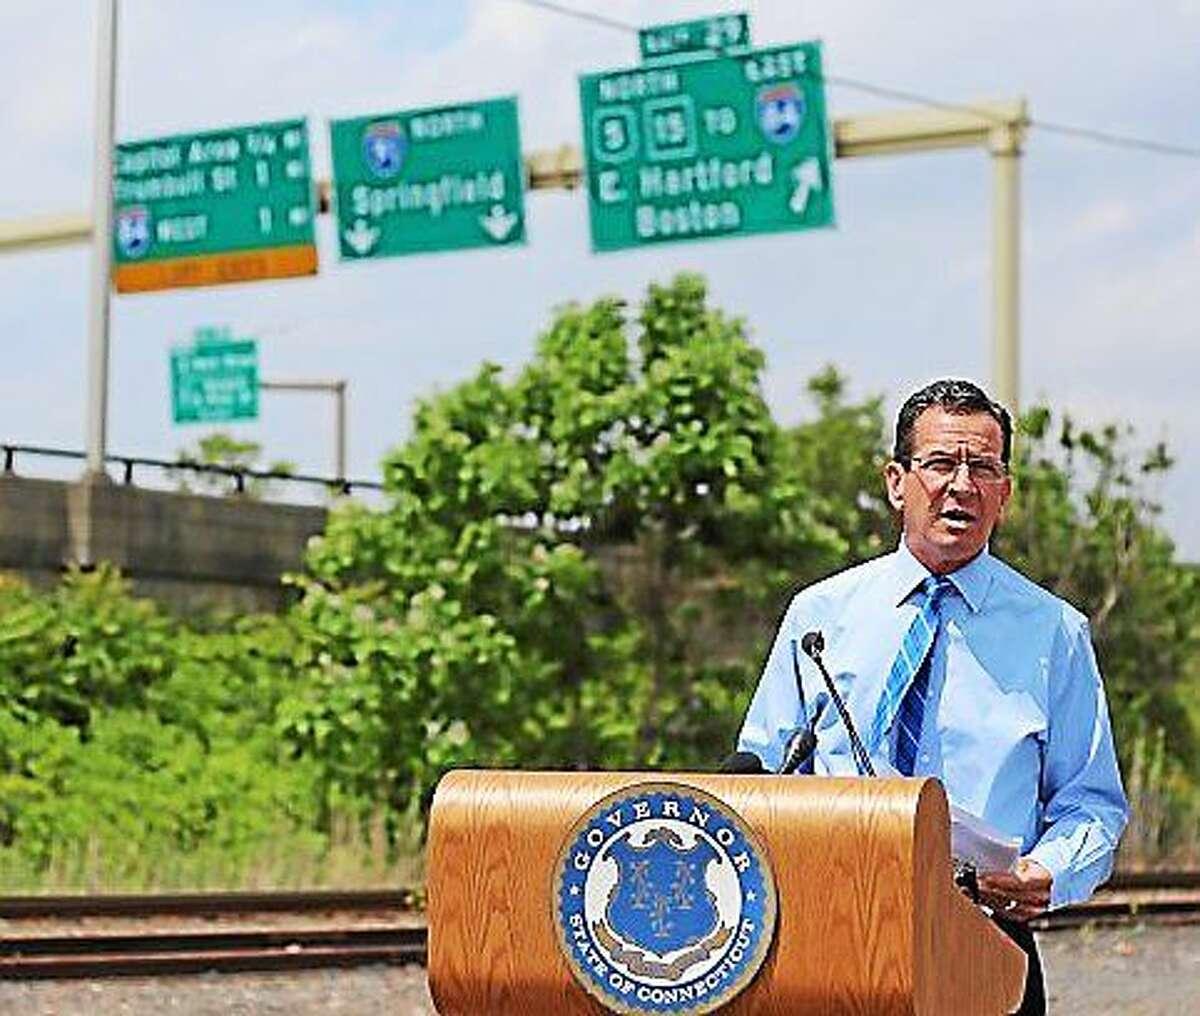 Gov. Dannel P. Malloy with the Charter Oak Bridge in Hartford in the background